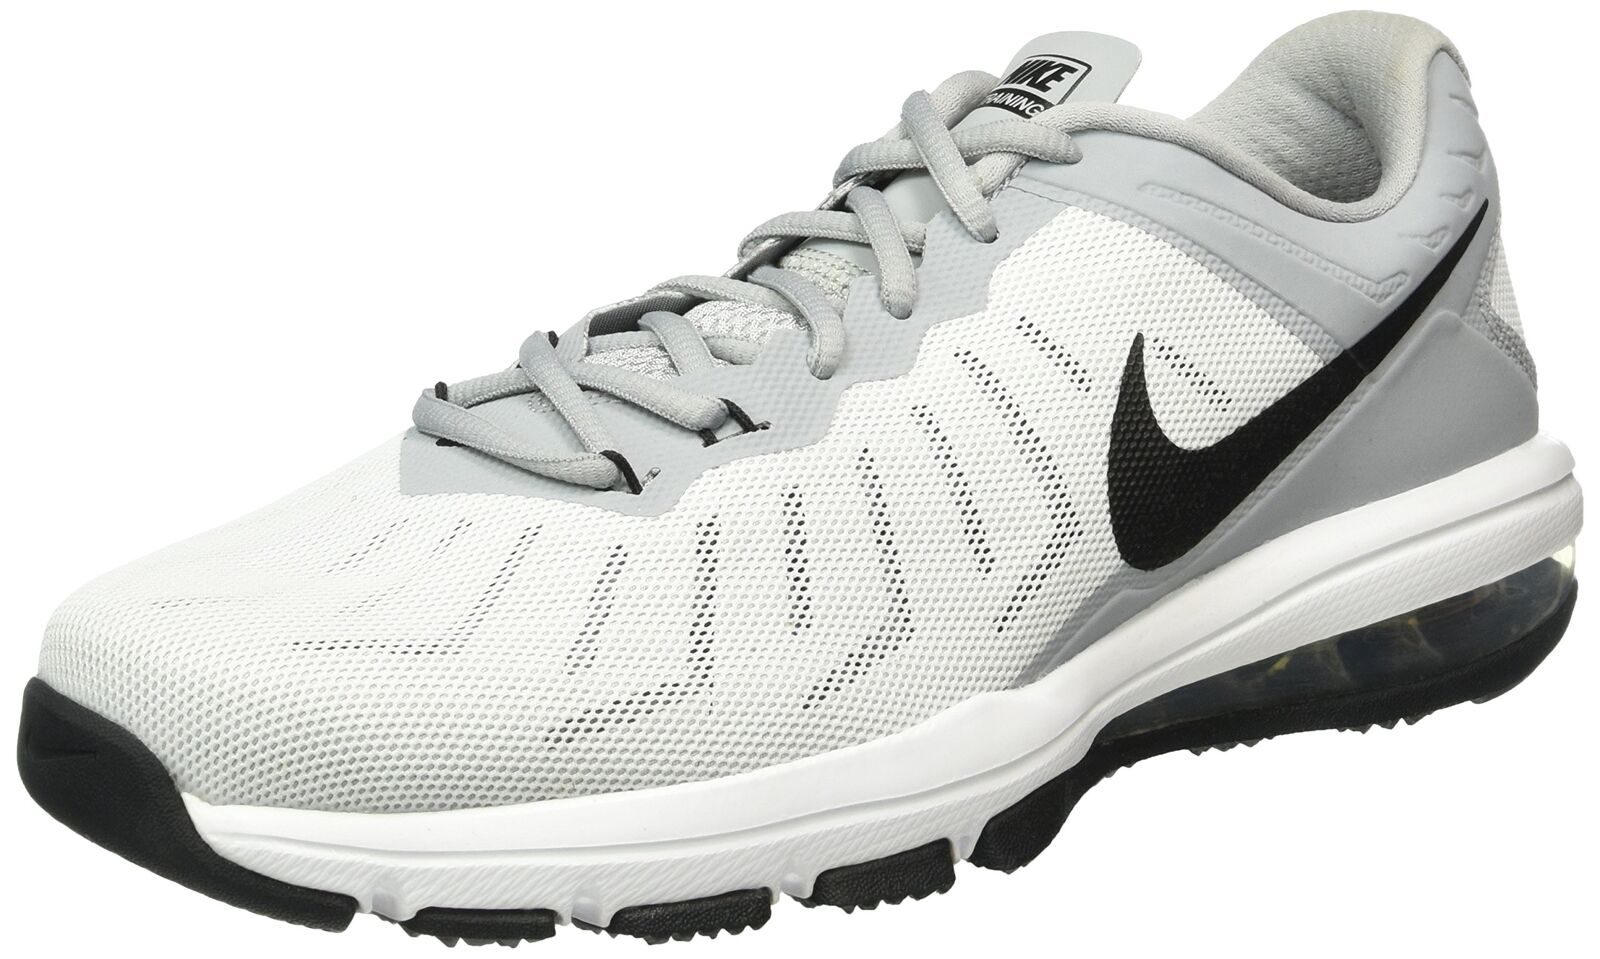 NIKE Men's Air Max Full Ride TR Training shoes White 9.5 D(M) US